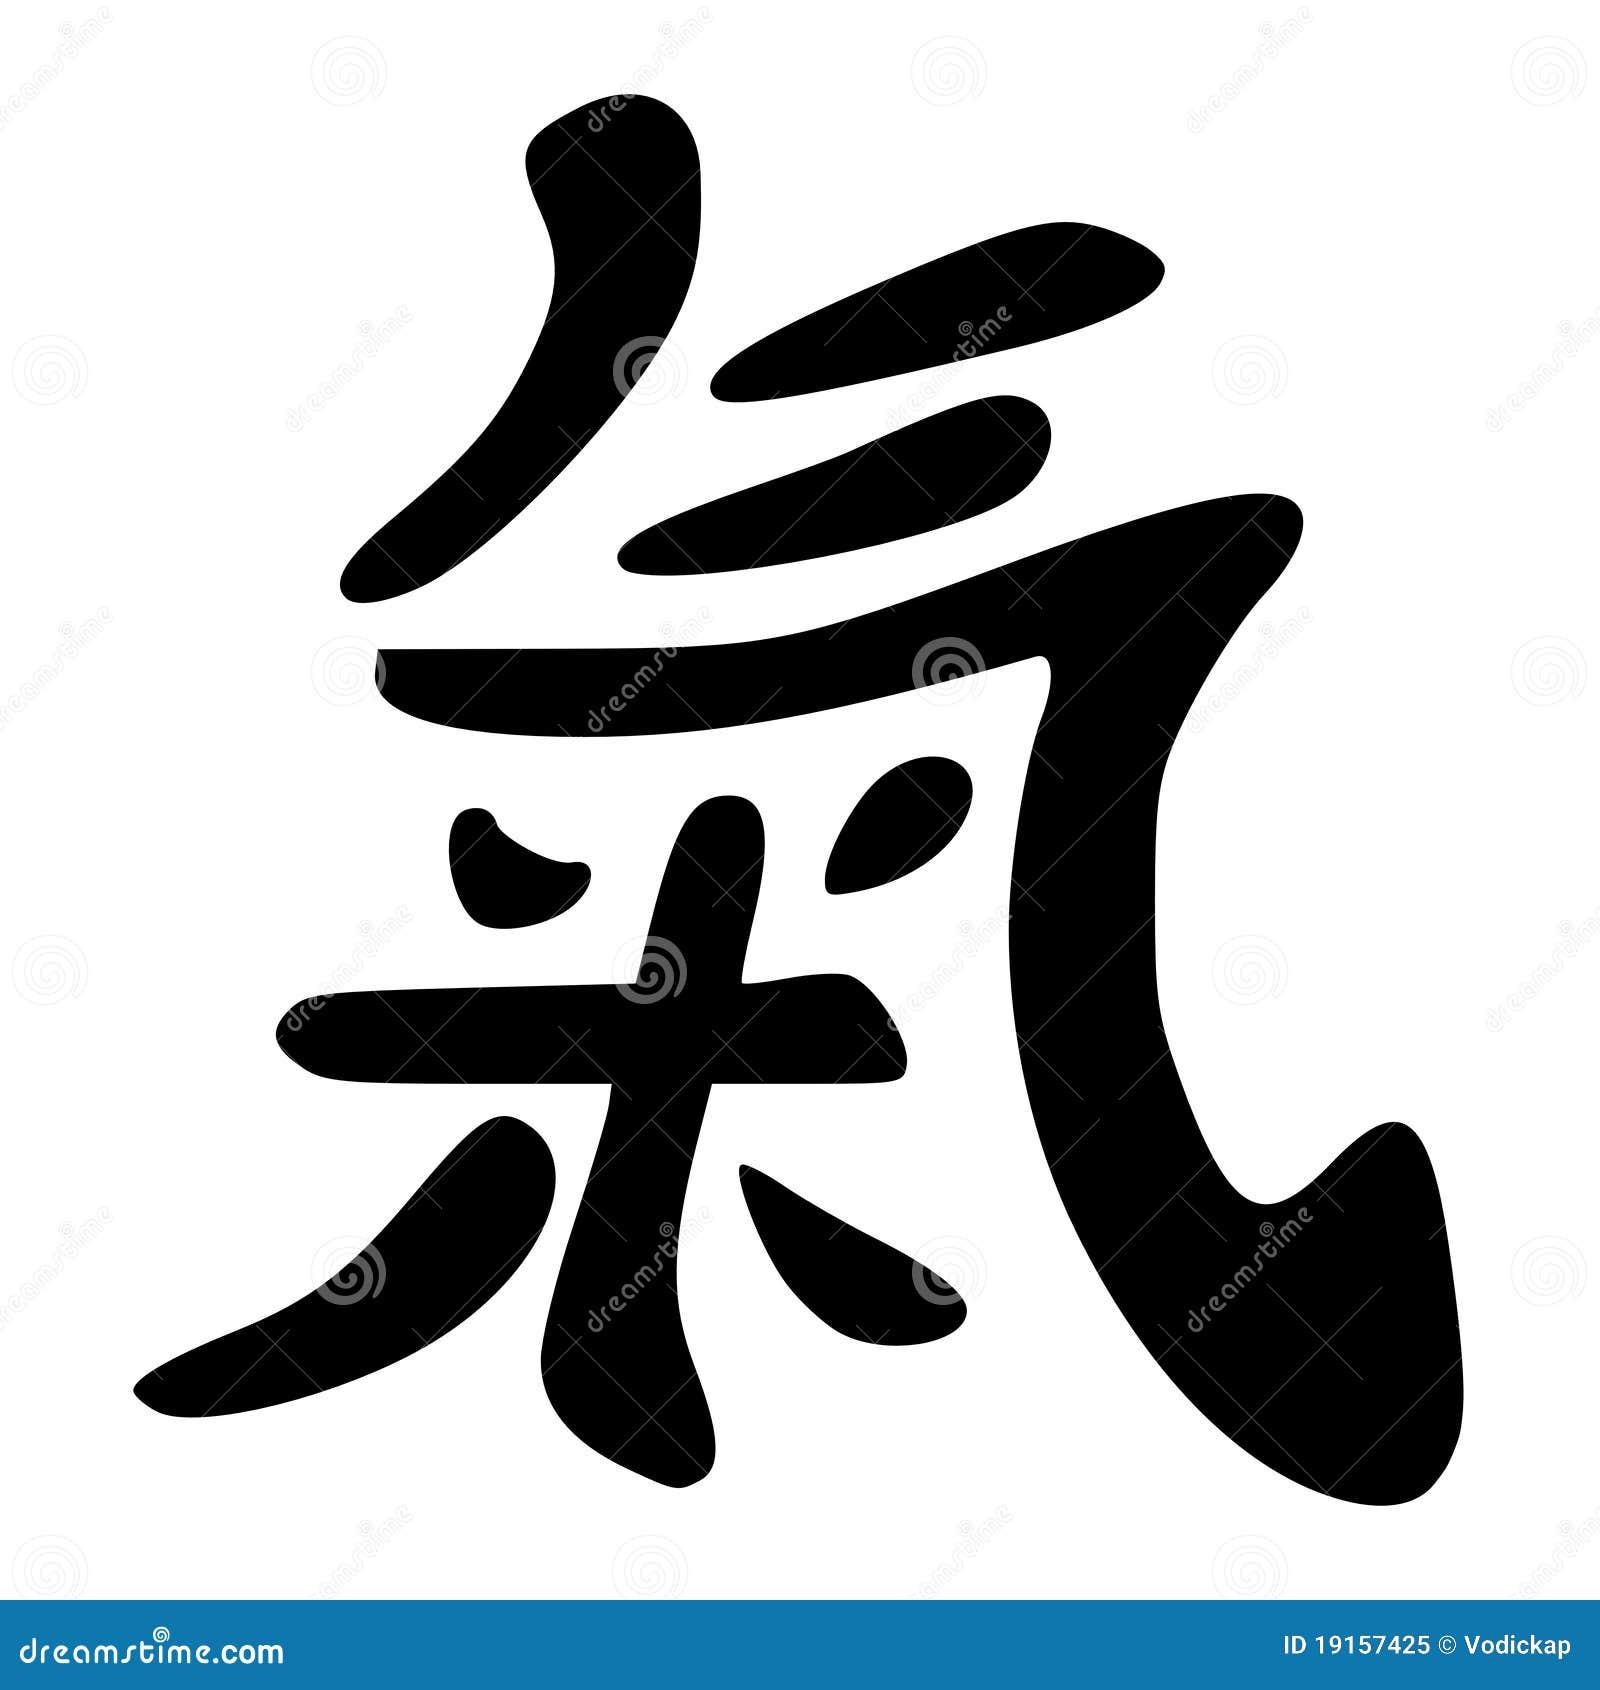 Chi symbol stock image image of japanese touch symbol 19157425 chi symbol biocorpaavc Gallery